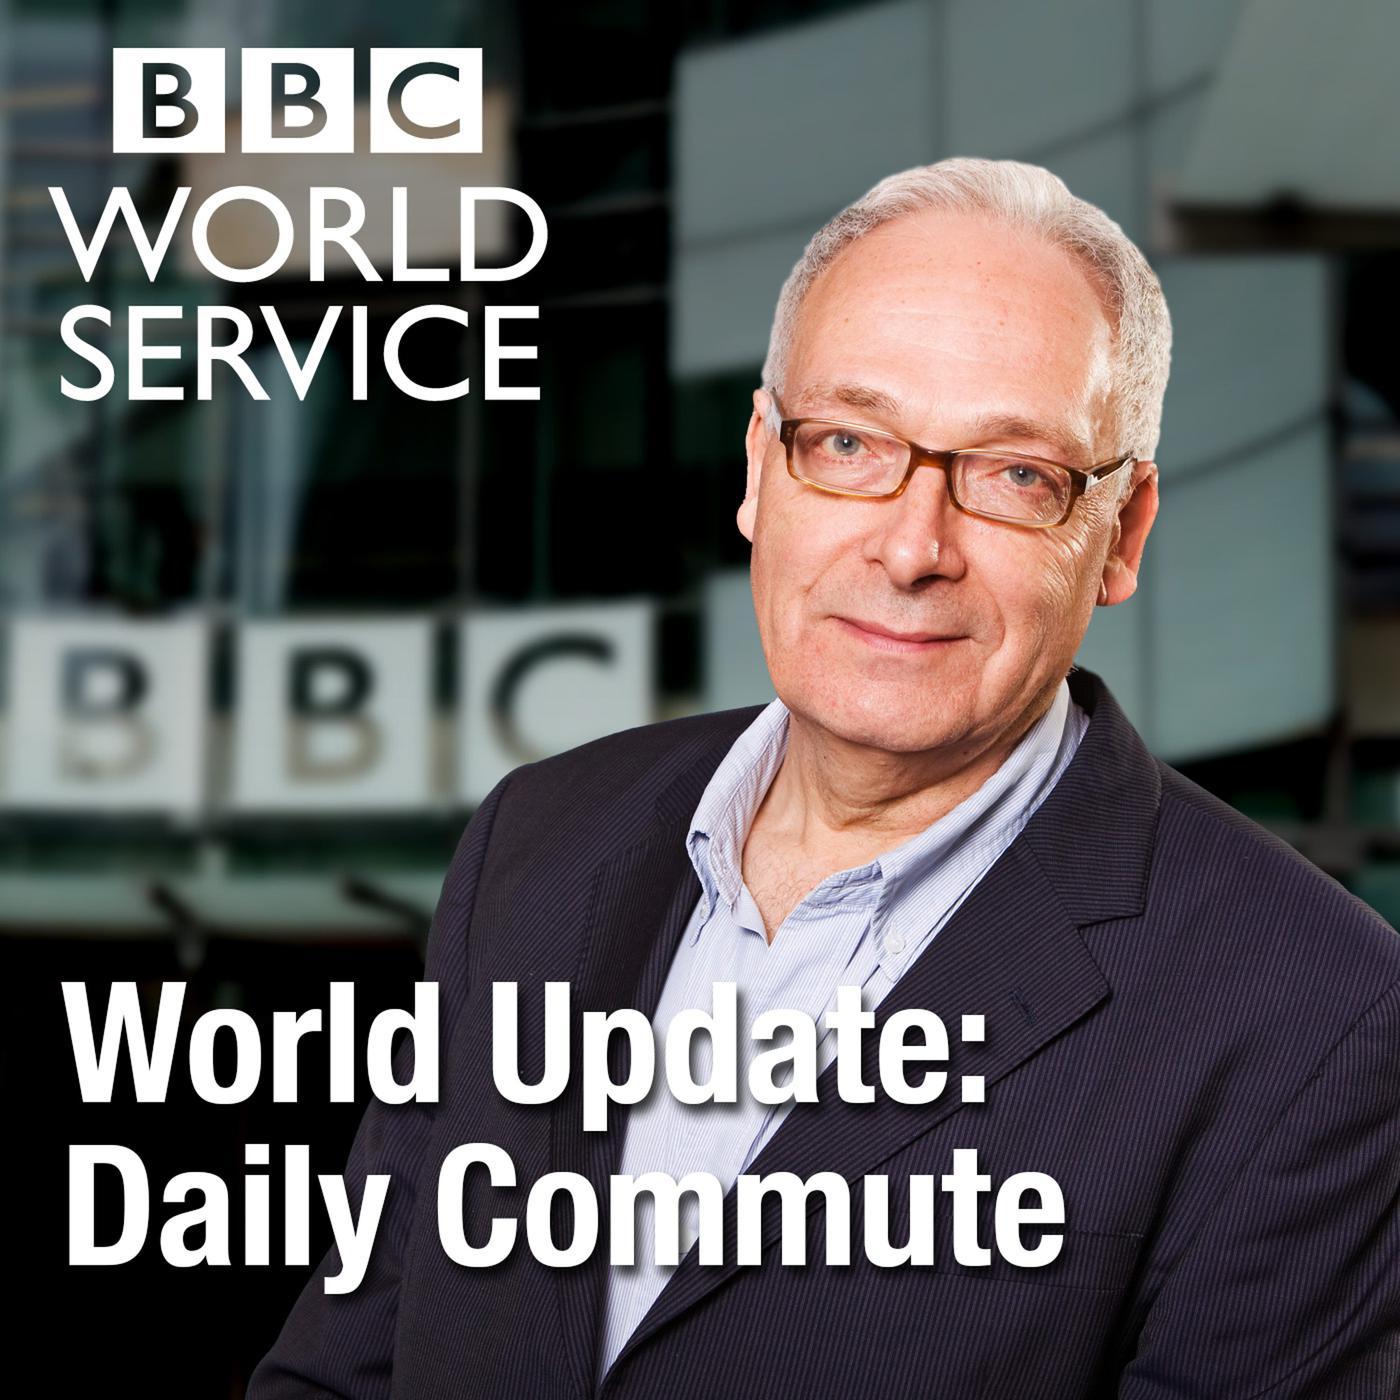 World Update: Daily Commute (podcast) - BBC World Service | Listen Notes